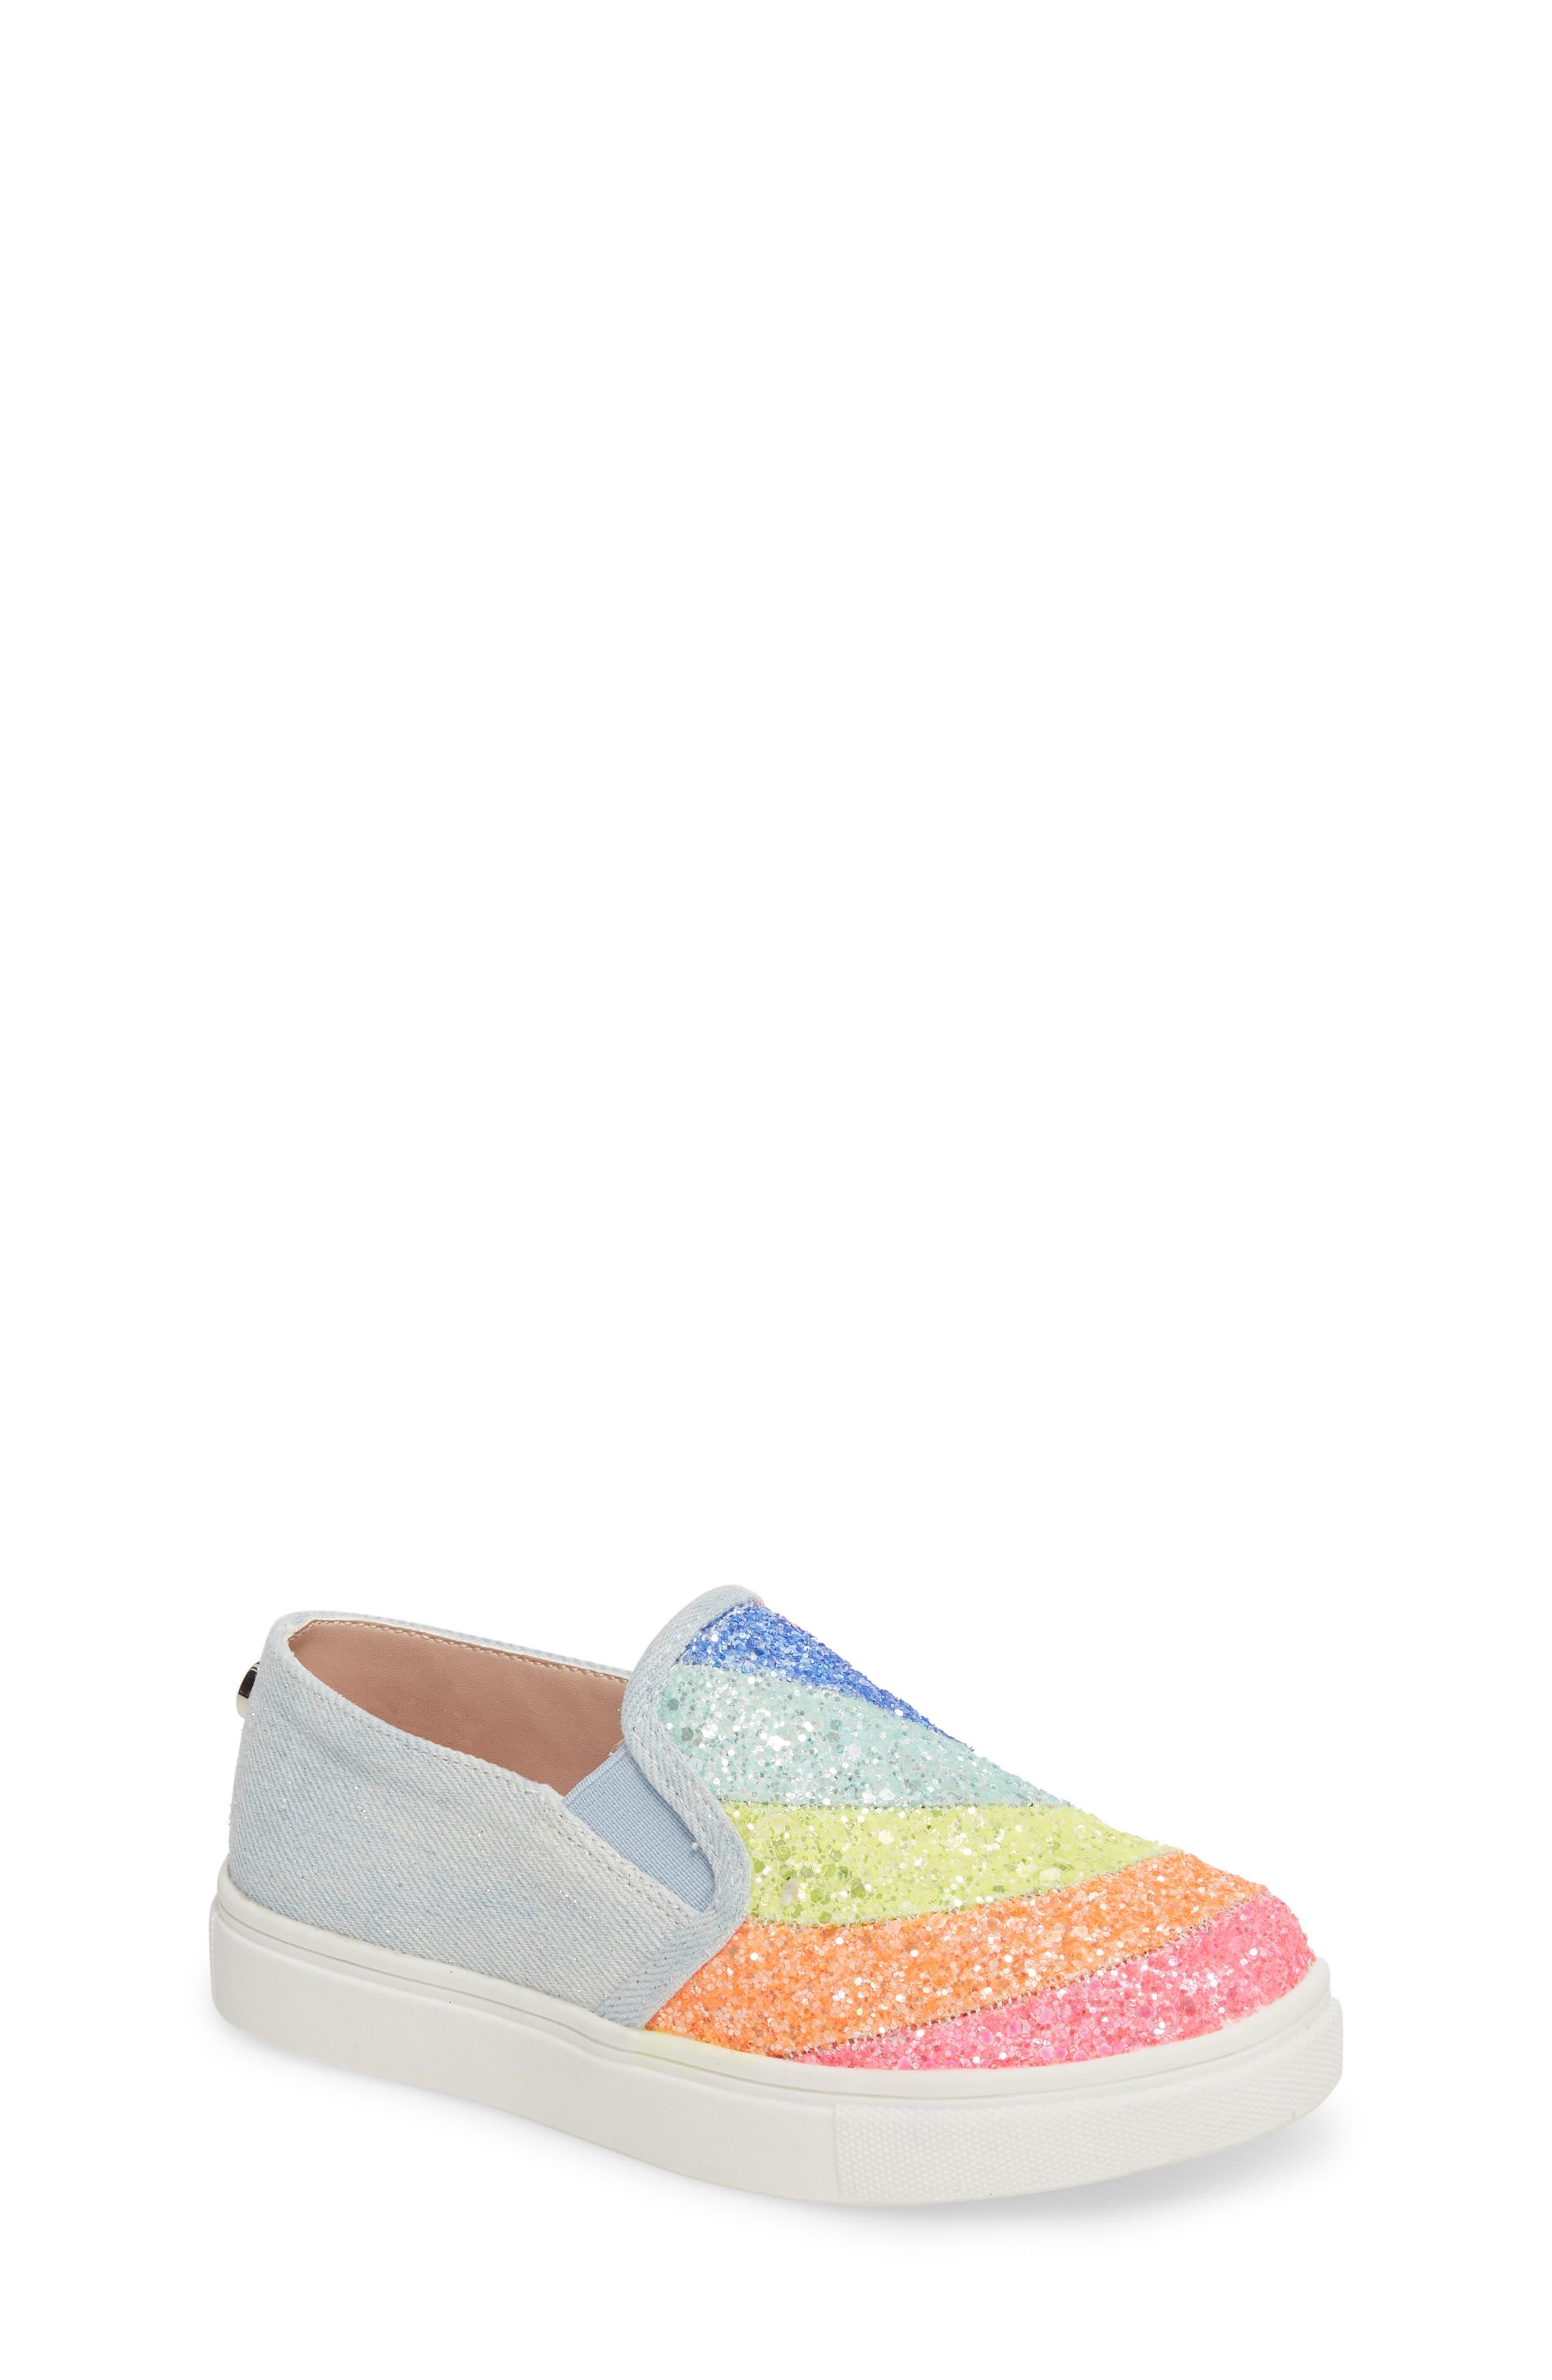 Steve Madden JWISH Rainbow Slip-On Sneaker (Little Kid & Big Kid)